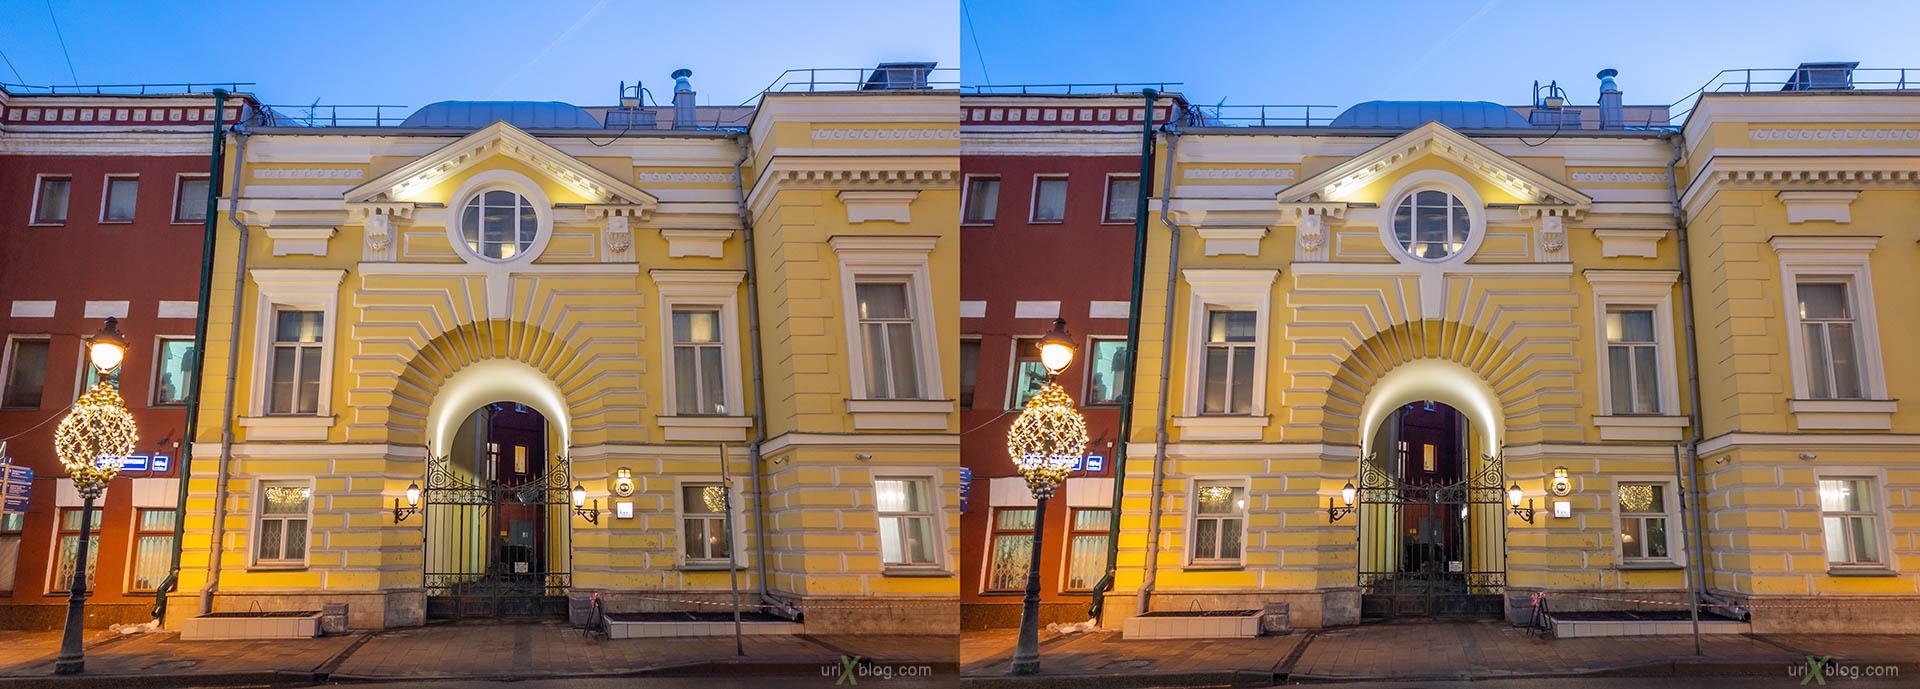 Helicon Opera, The main house of the urban estate of the Streshnevs-Glebovs-Shakhovskys, Bolshaya Nikitskaya street, Moscow, Russia, 3D, stereo pair, cross-eyed, crossview, cross view stereo pair, stereoscopic